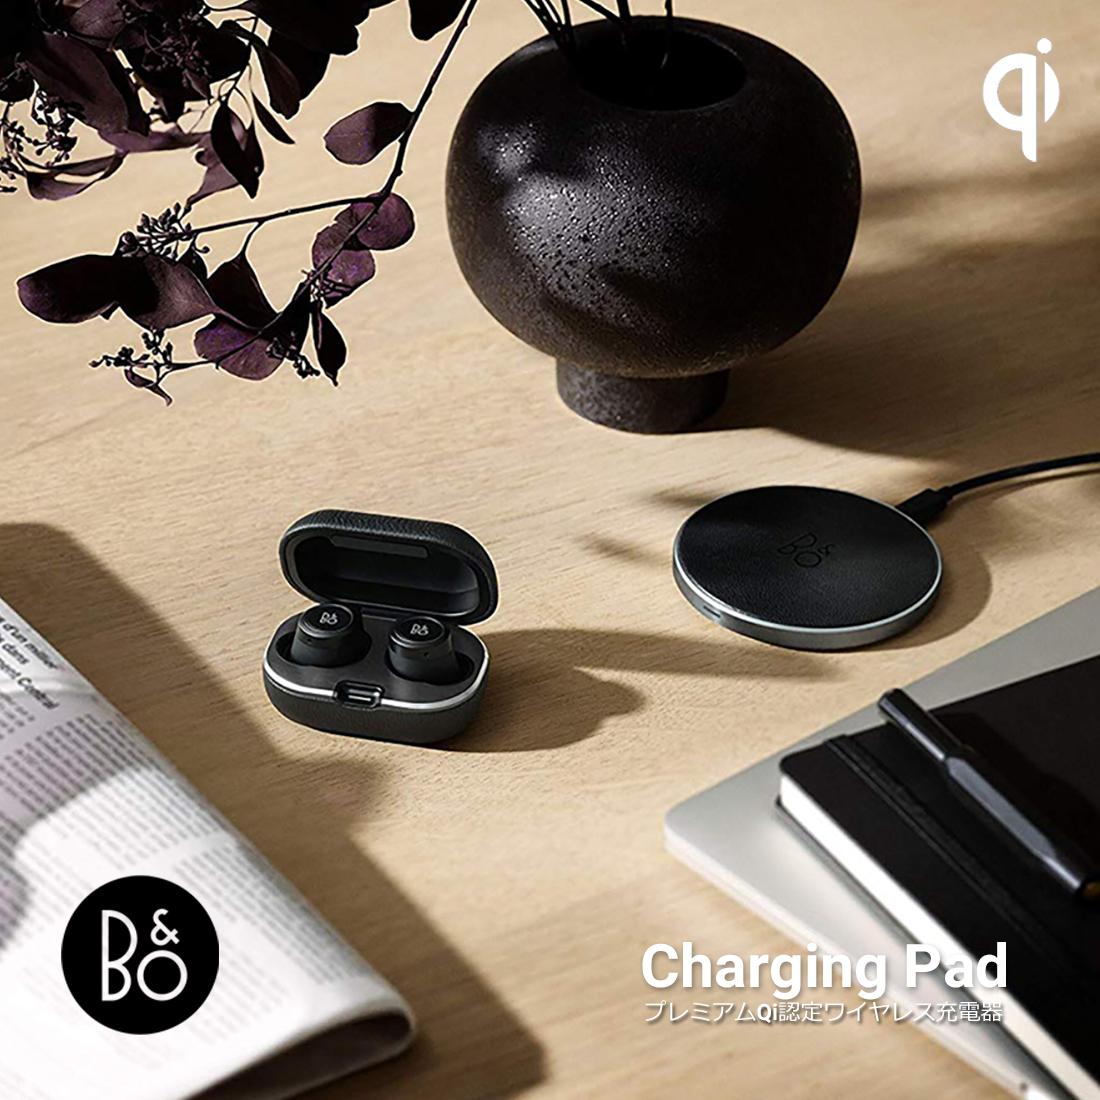 【BANG & OLUFSEN】Charging pad ※チャージングパッドのみの販売です。 バング&オルフセン  ChargerPad Beoplay B&O ワイヤレス充電器/ Bang & Olufsen/Qi 対応デバイス/ワイヤレス認定 EPP/ワイヤレスチャージャー【コンビニ受取対応商品】